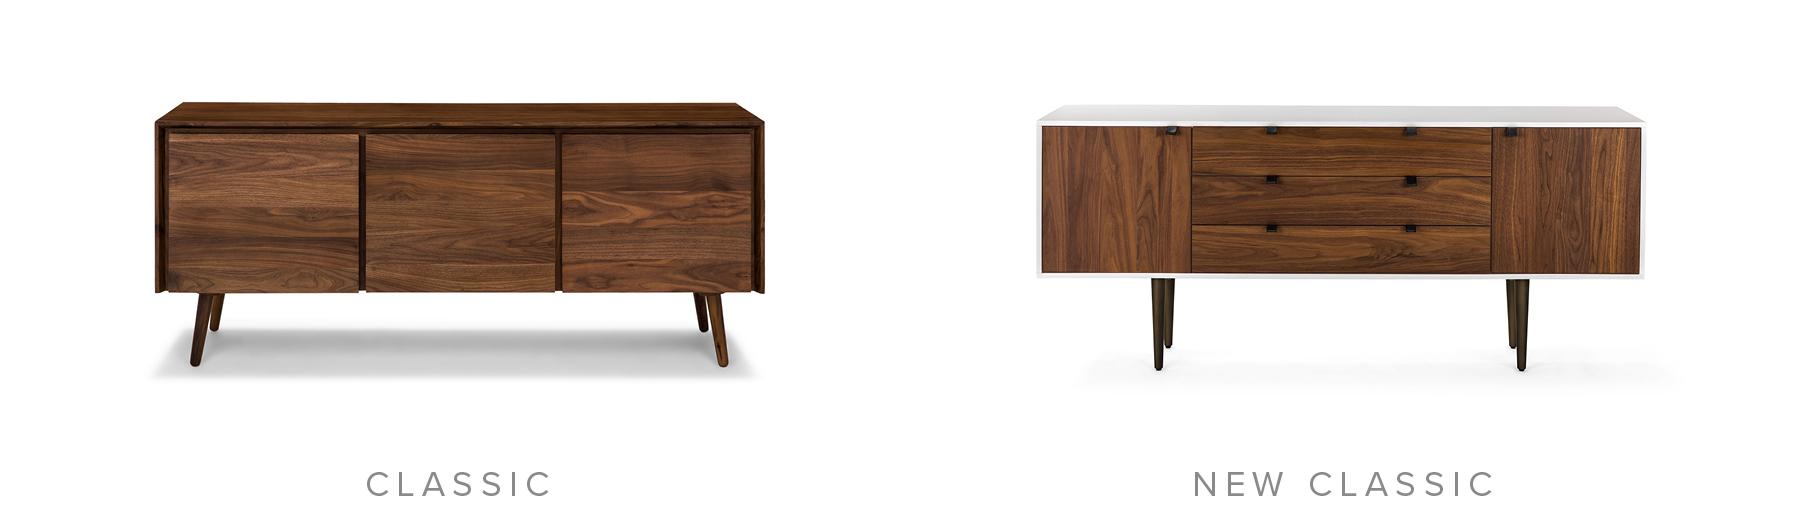 Classic: Seno Walnut Sideboard. New Classic: Envelo Sideboard